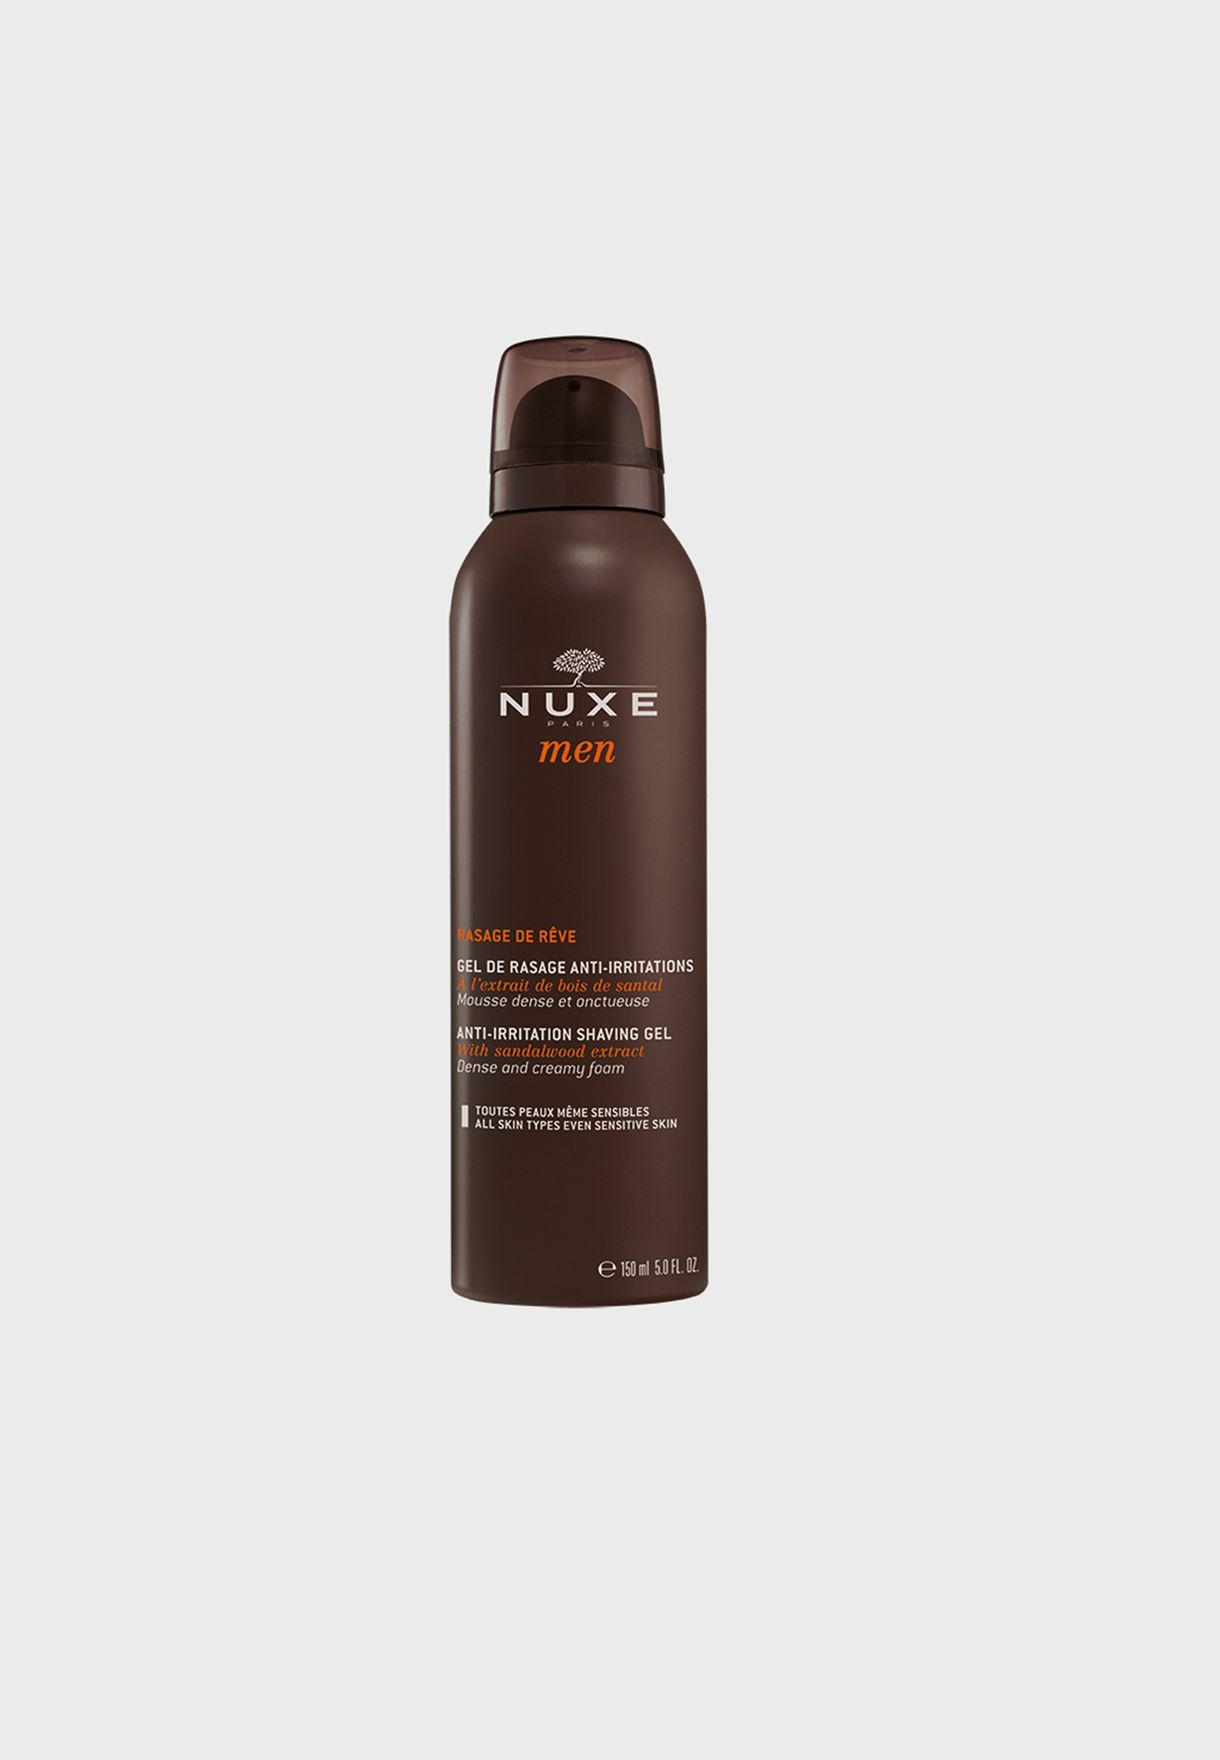 Anti-Irritation Shaving Gel